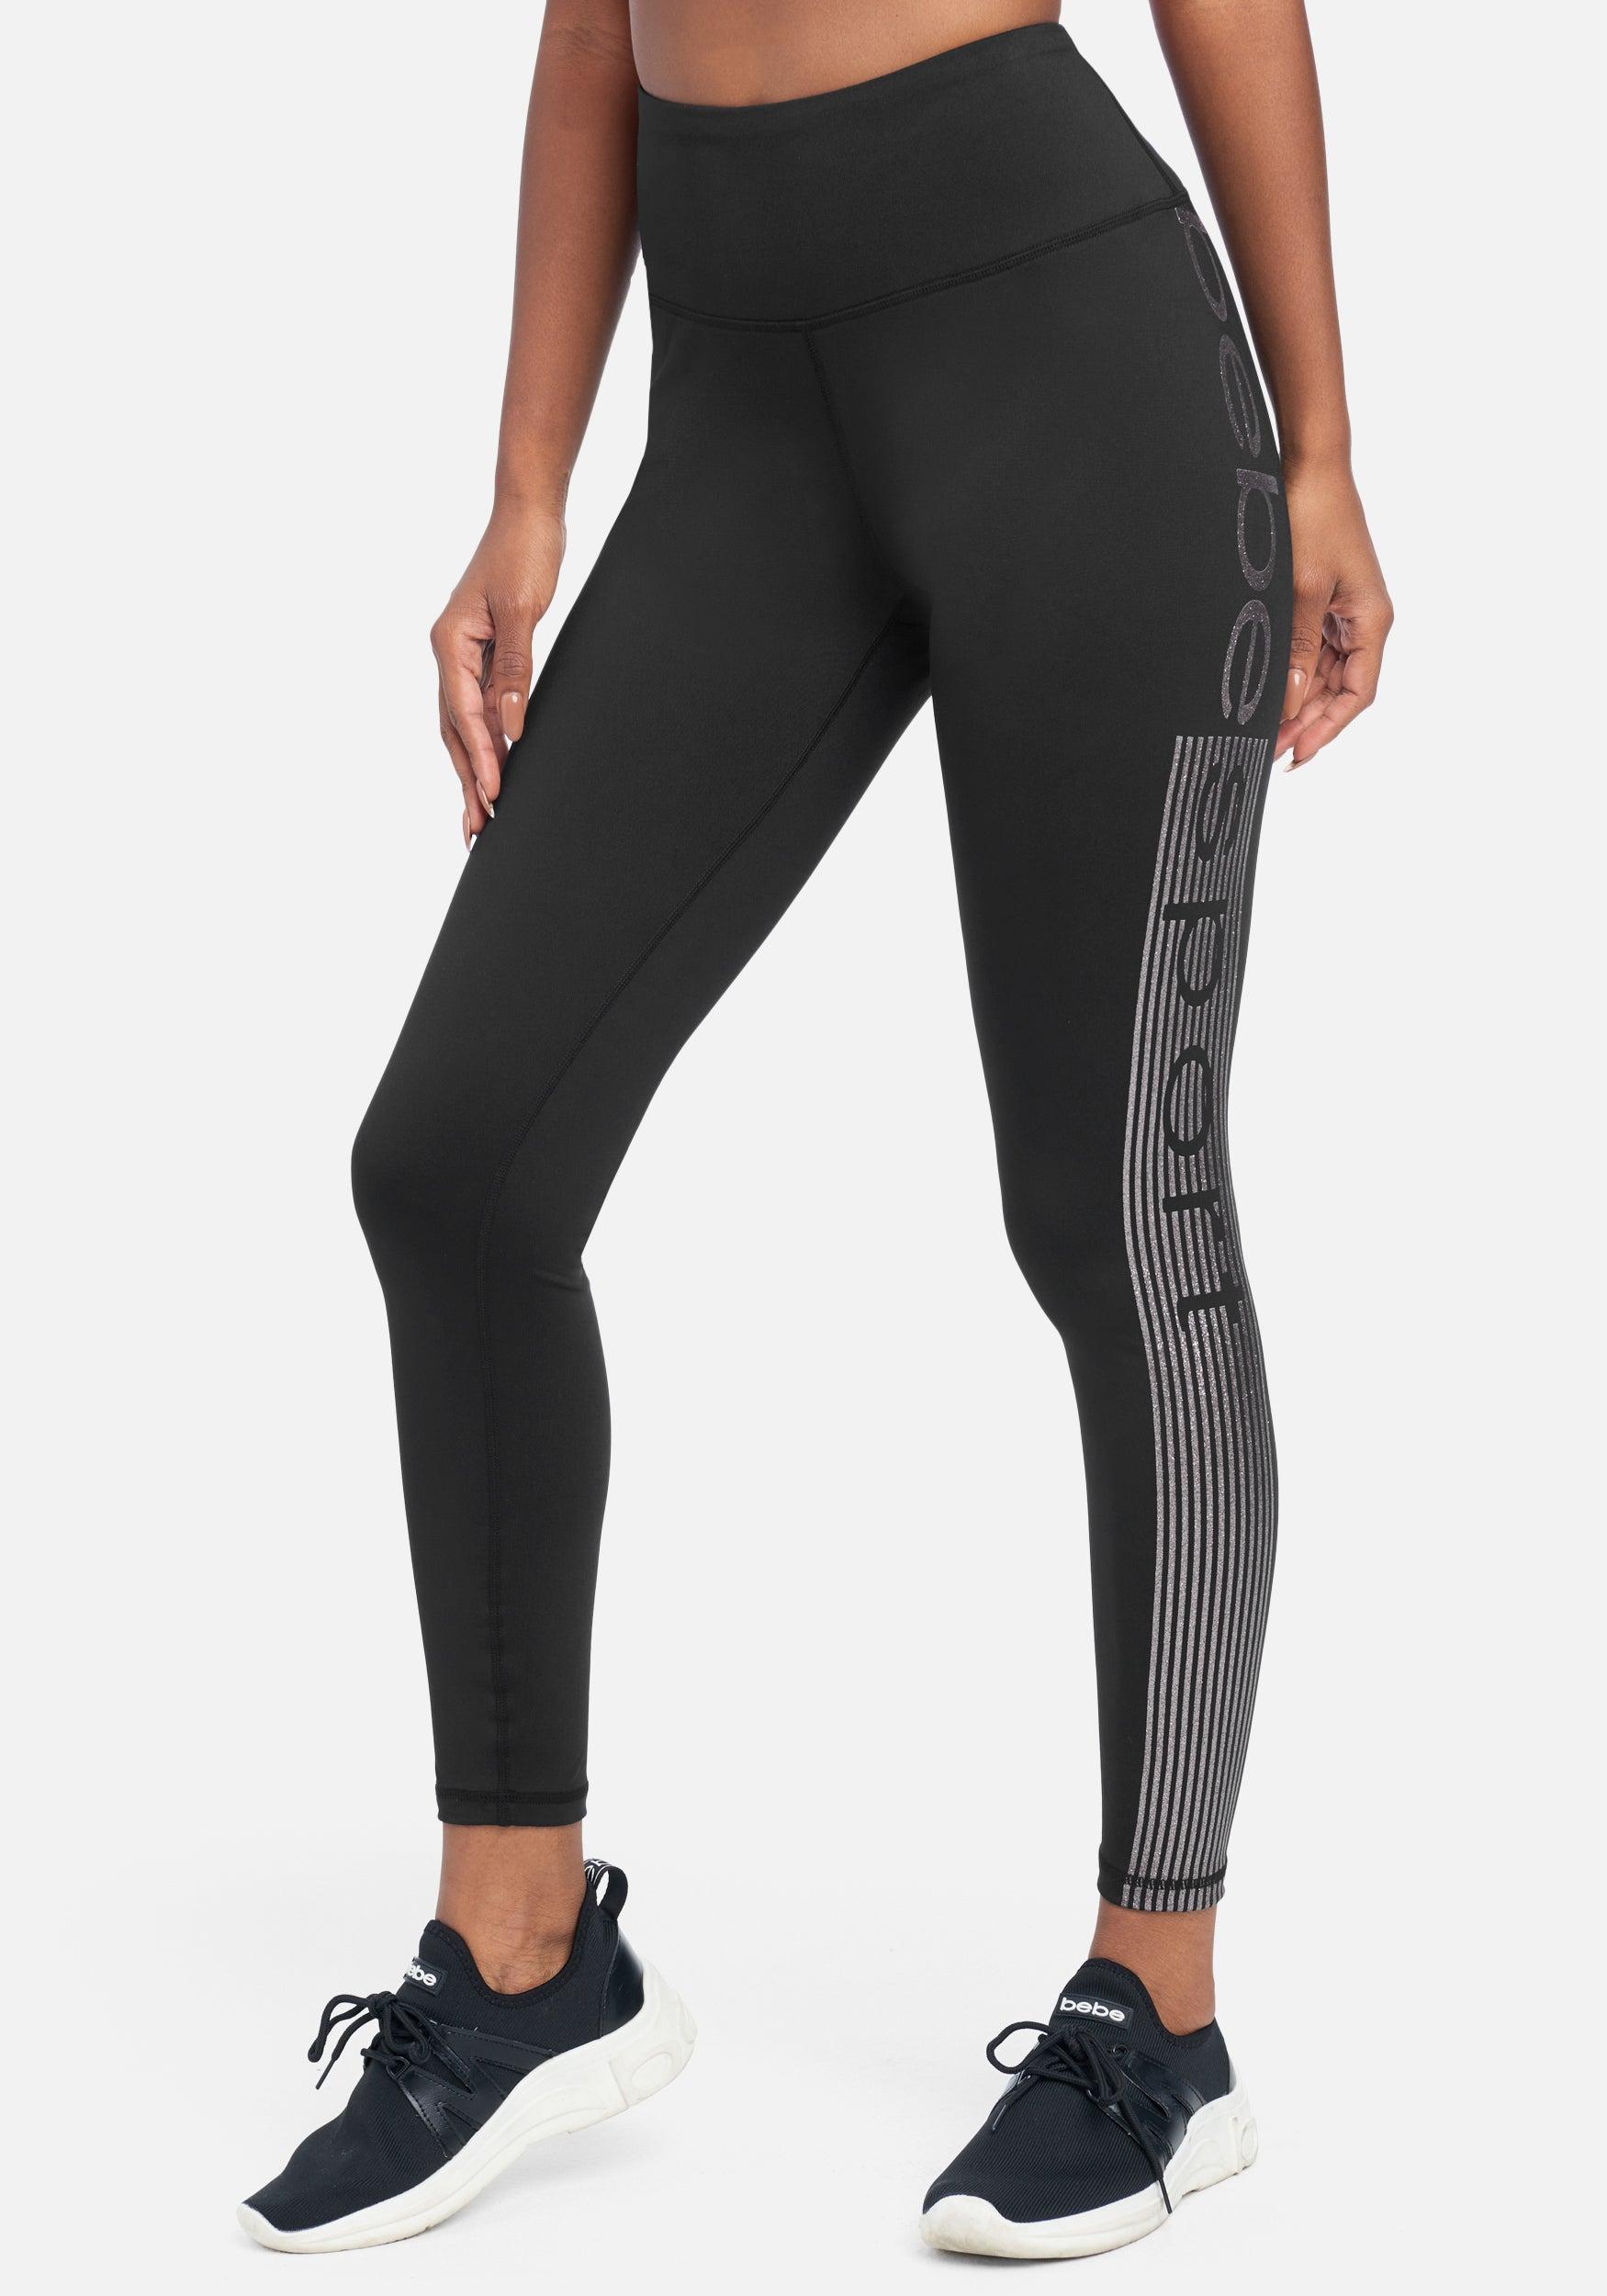 bebe Women's Bebe Sport Logo Legging, Size Medium in Black with Silver Glitter Metal/Spandex